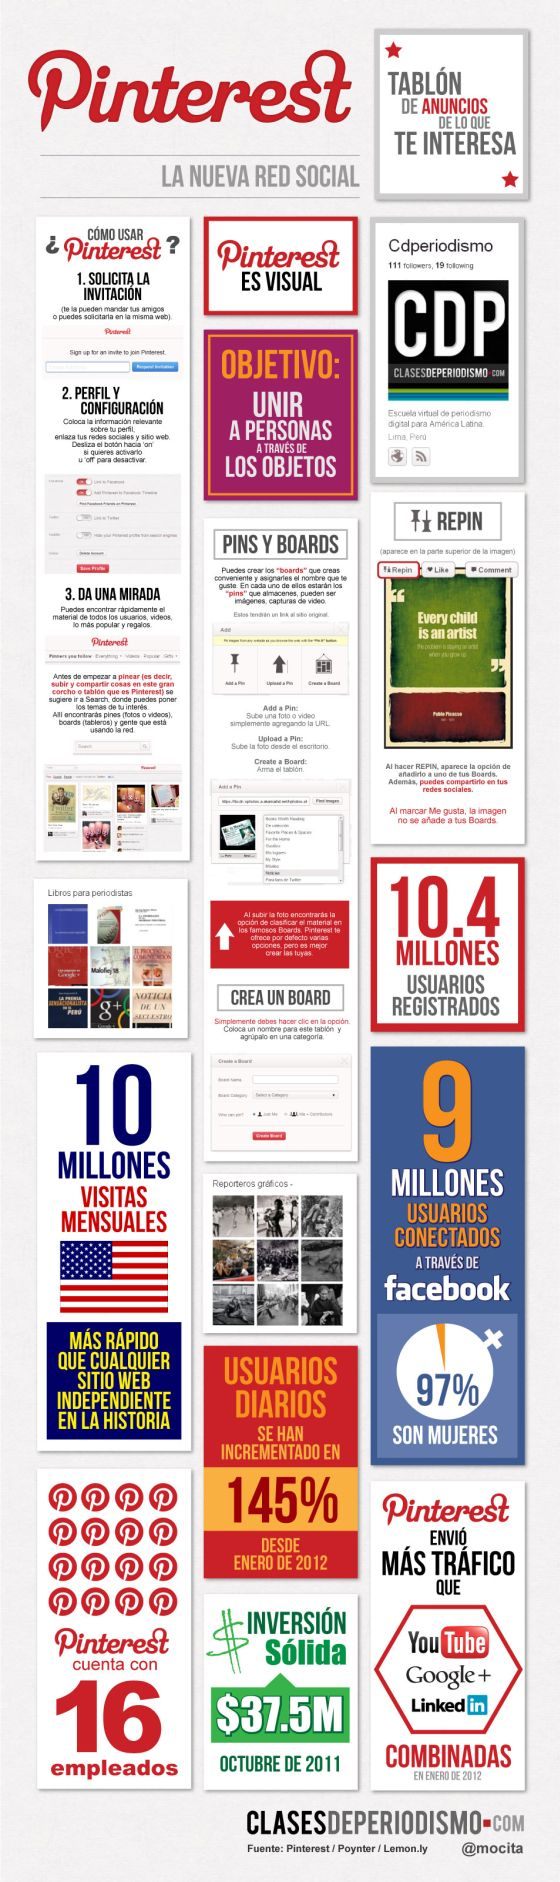 Pinterest infographics (in Spanish, lo siento)